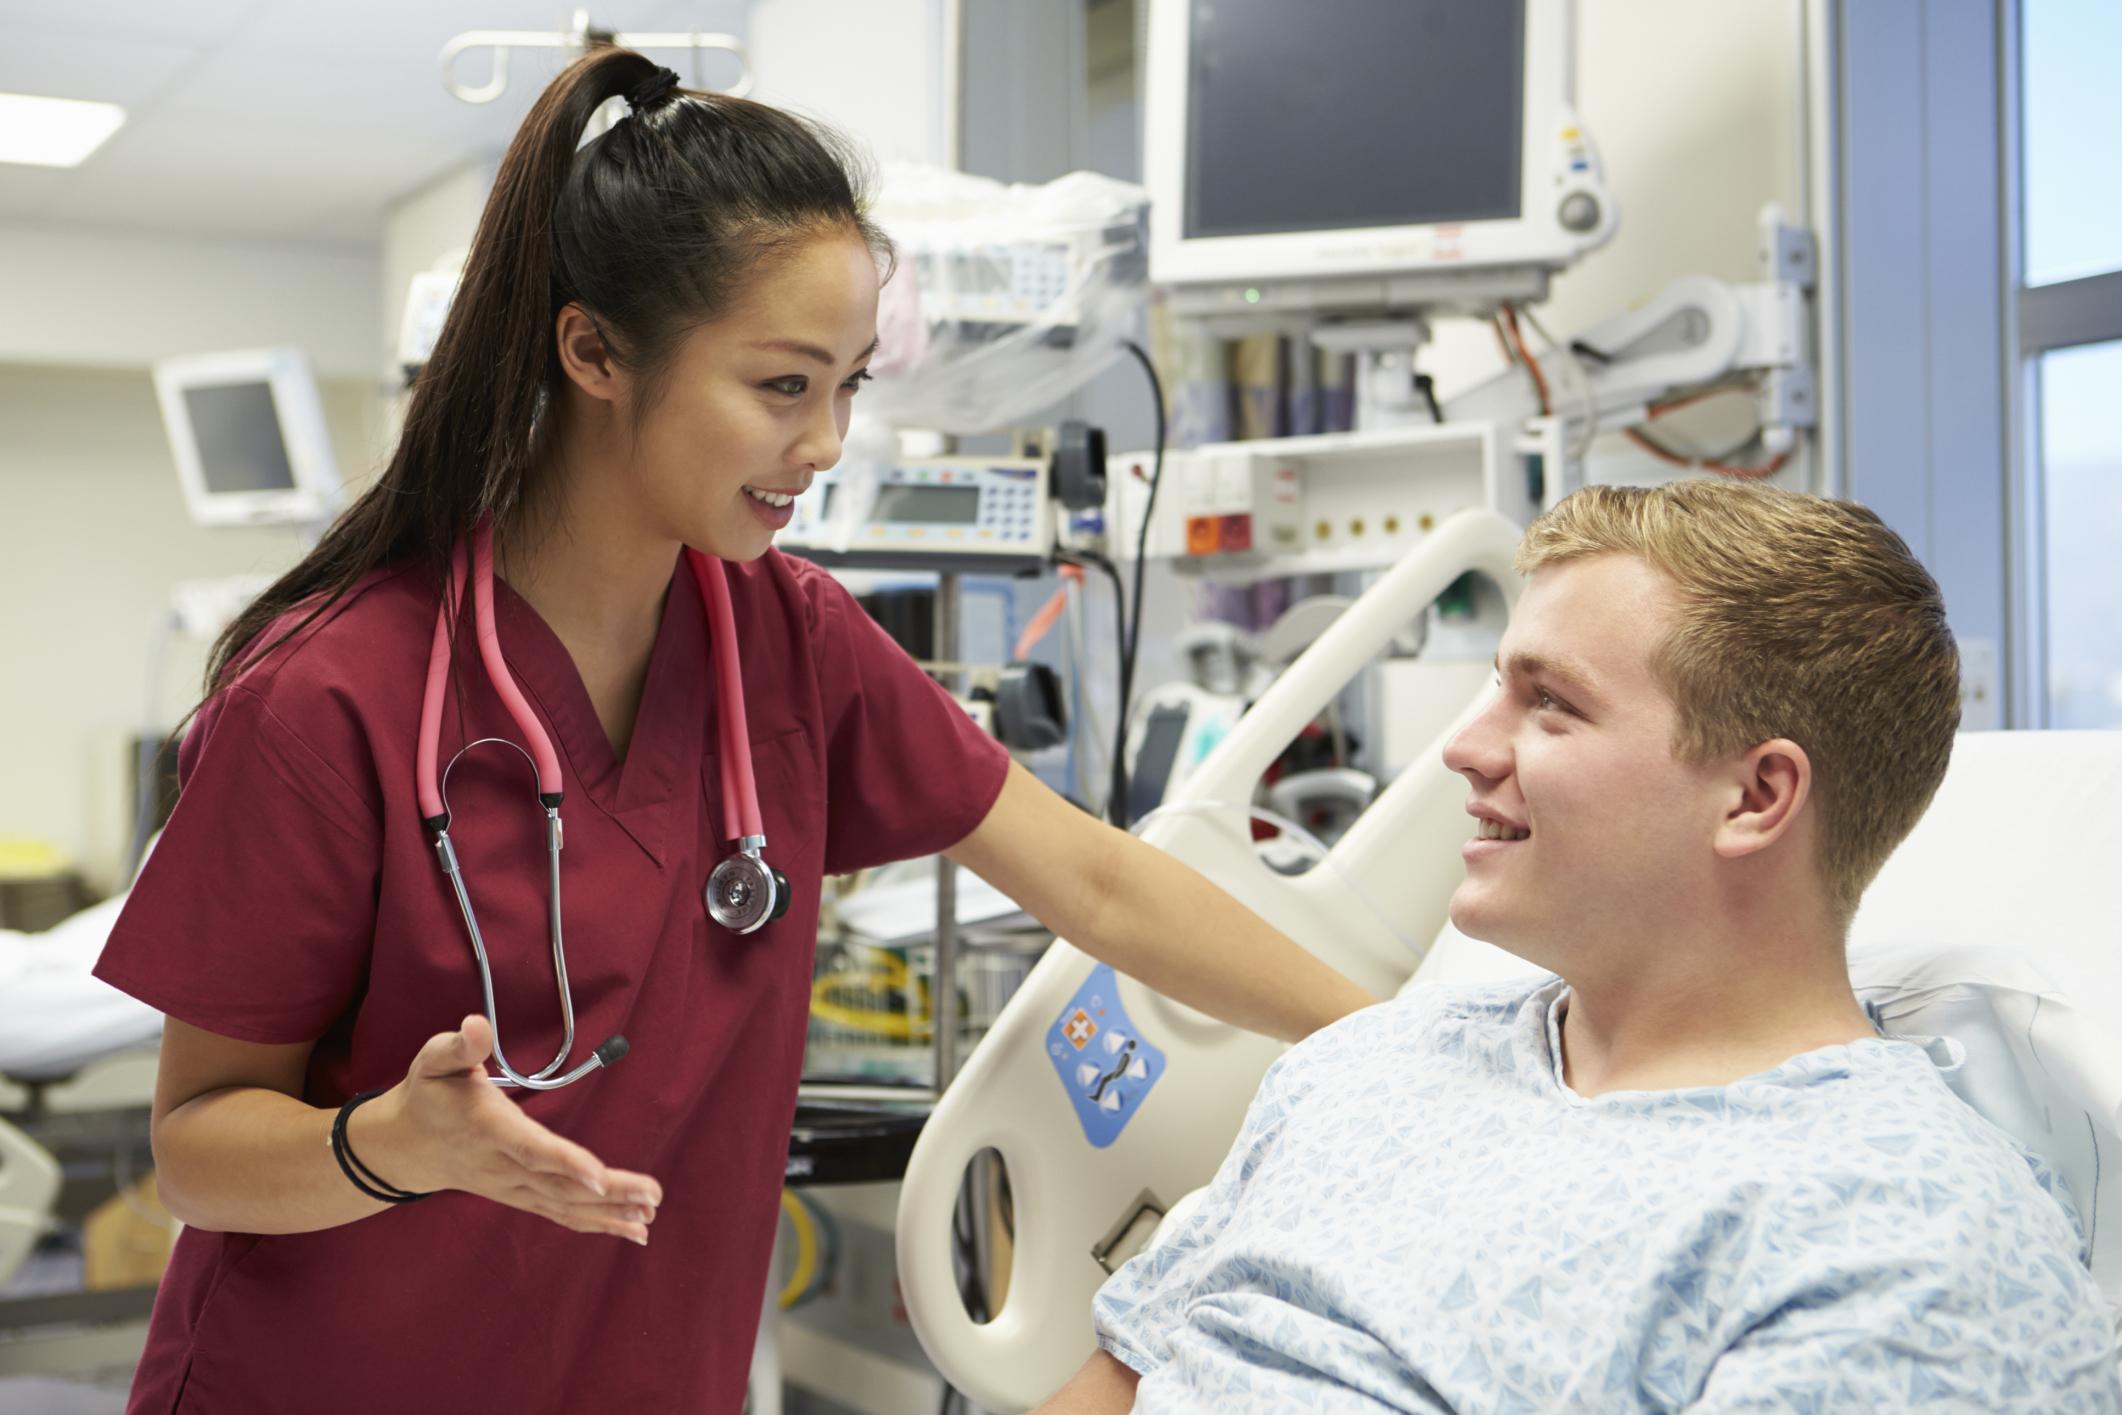 List of Nursing Skills for a Resume | Career Trend